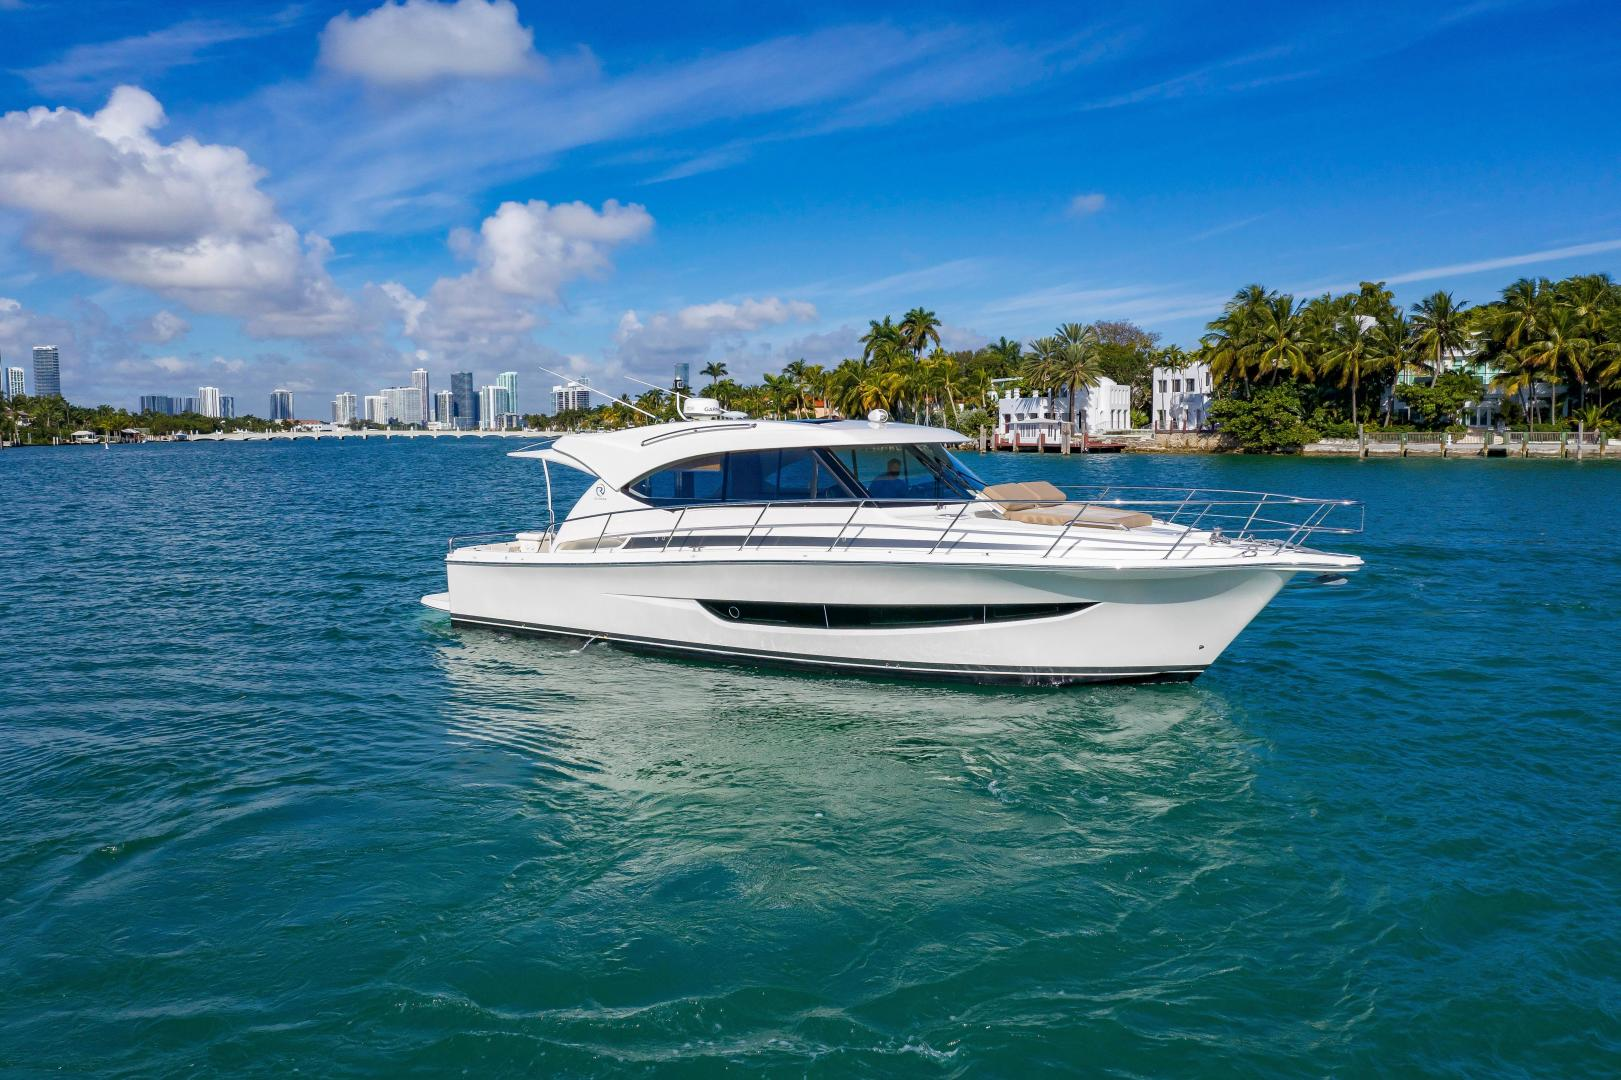 Riviera-395 SUV 2019-Ipanema Miami Beach-Florida-United States-1614869   Thumbnail